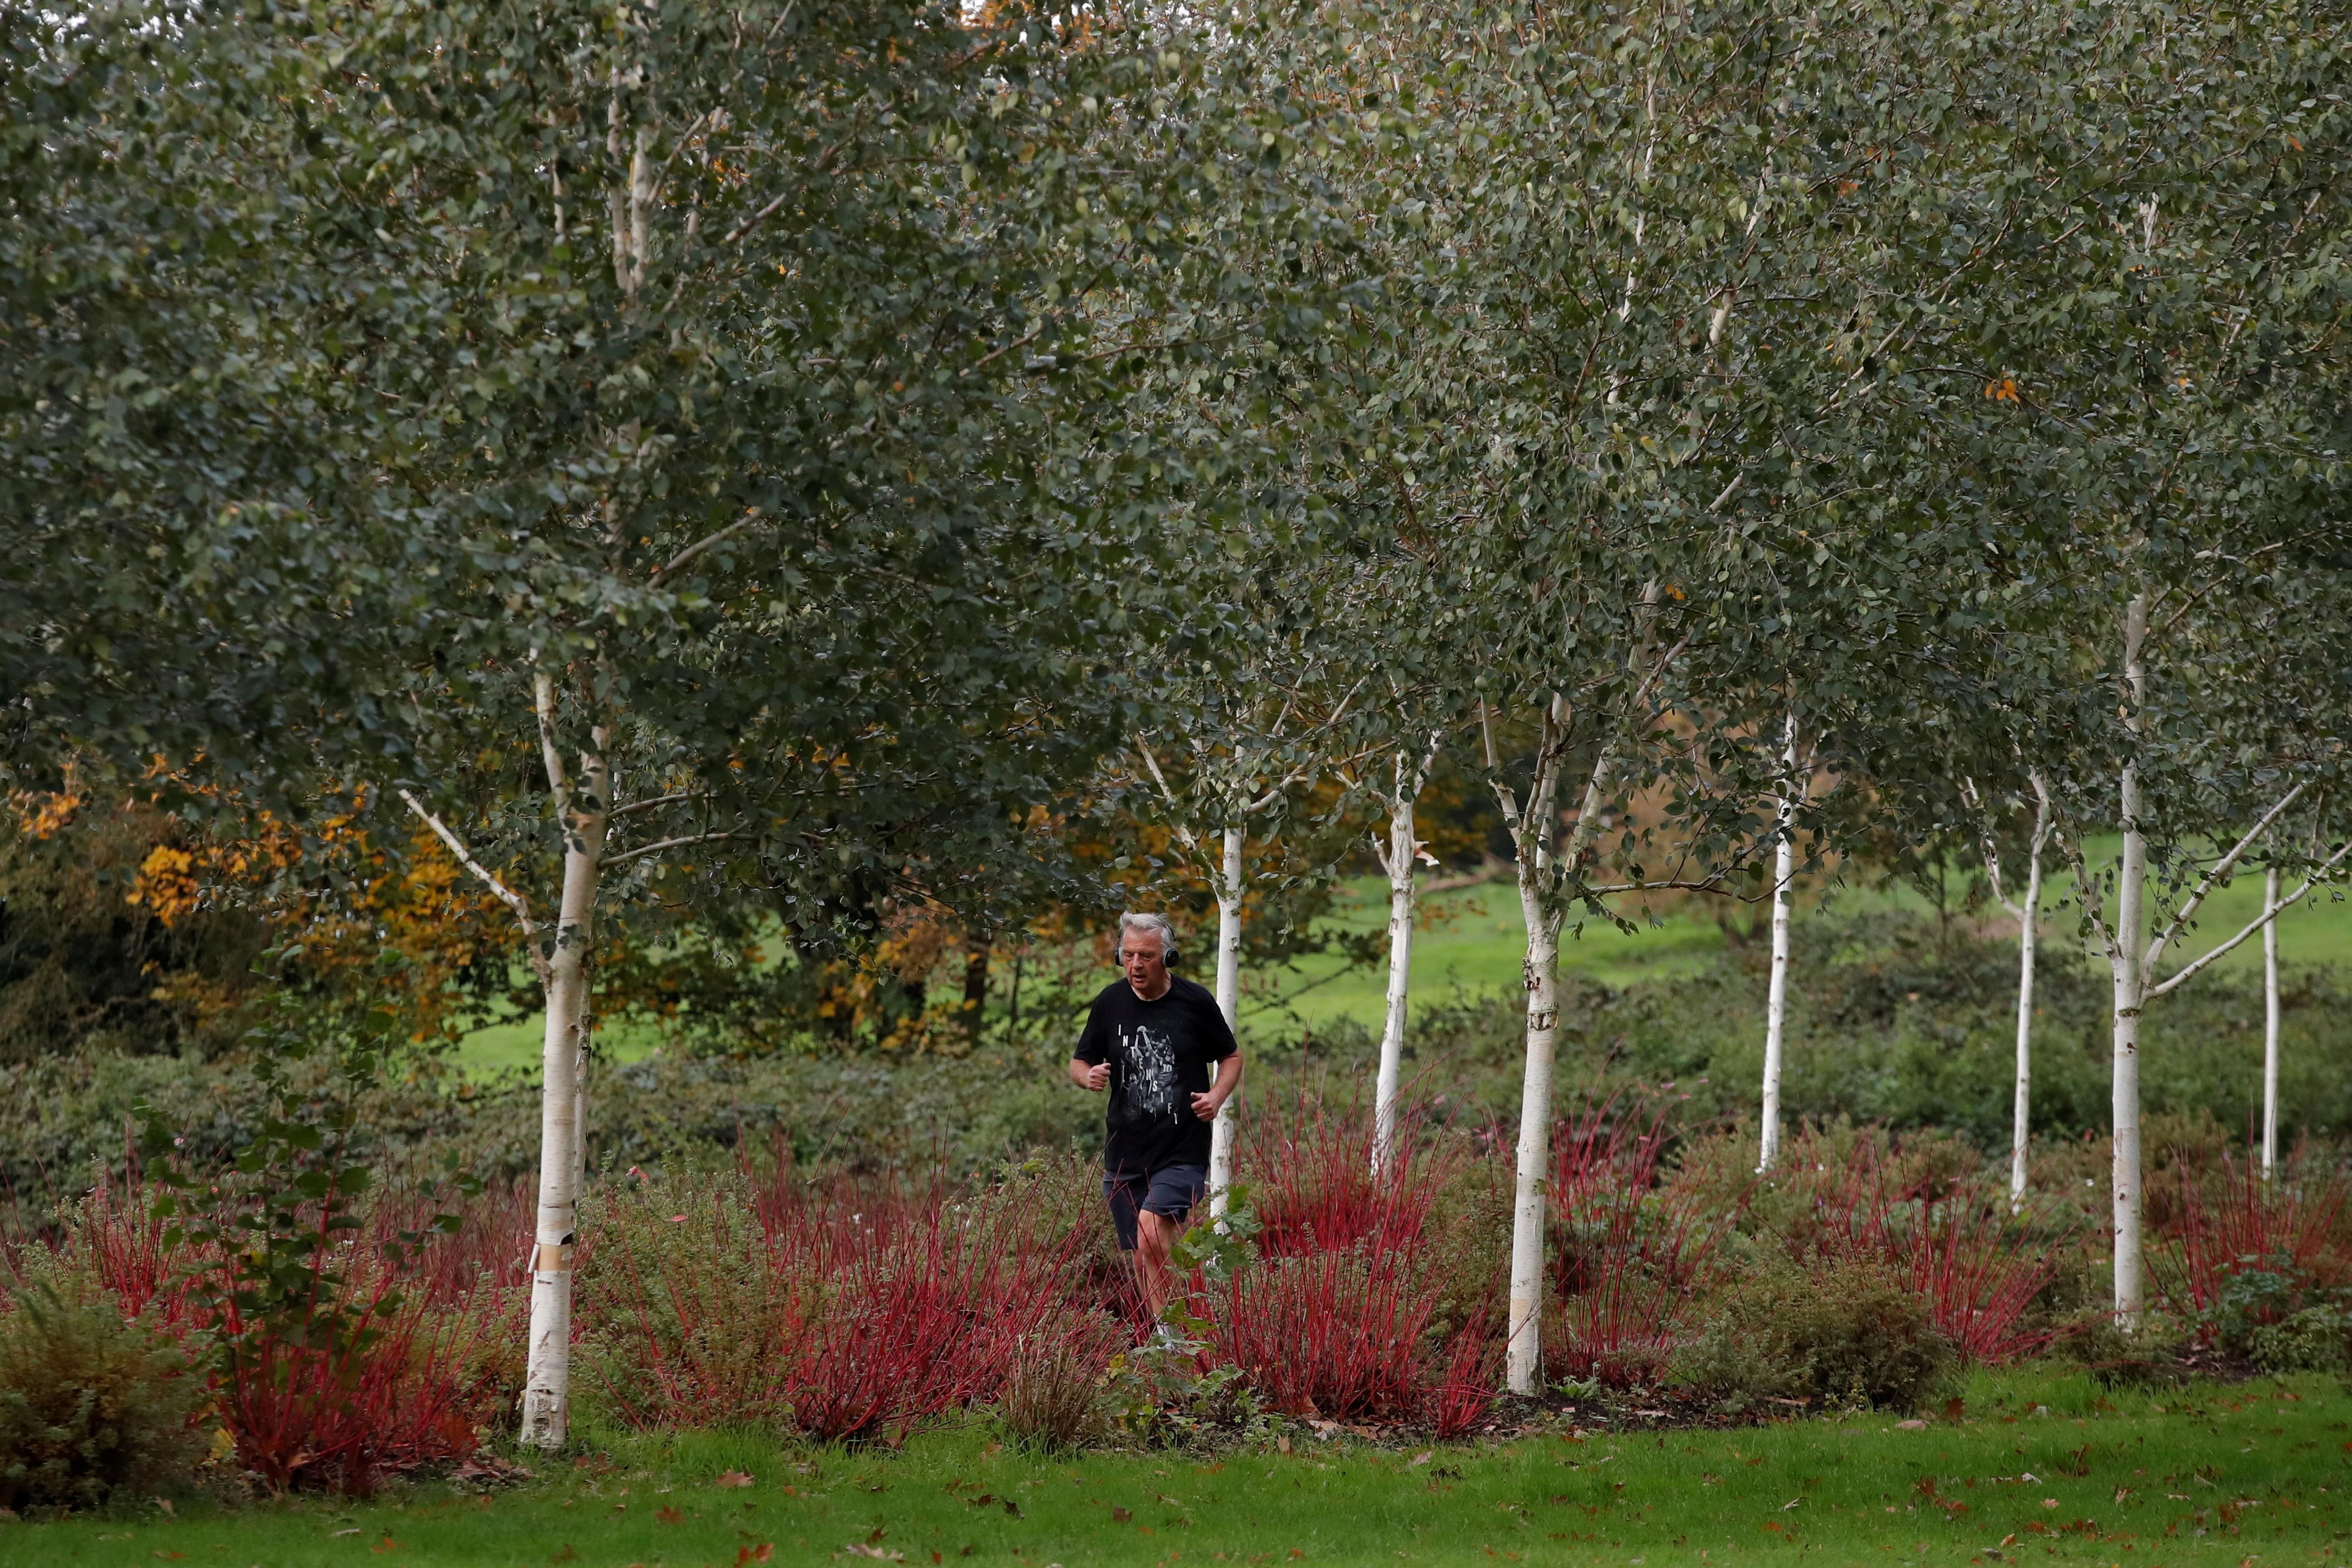 A man runs through trees in Barclay Park, Hoddesdon, Britain October 22, 2020. REUTERS/Andrew Couldridge/File Photo